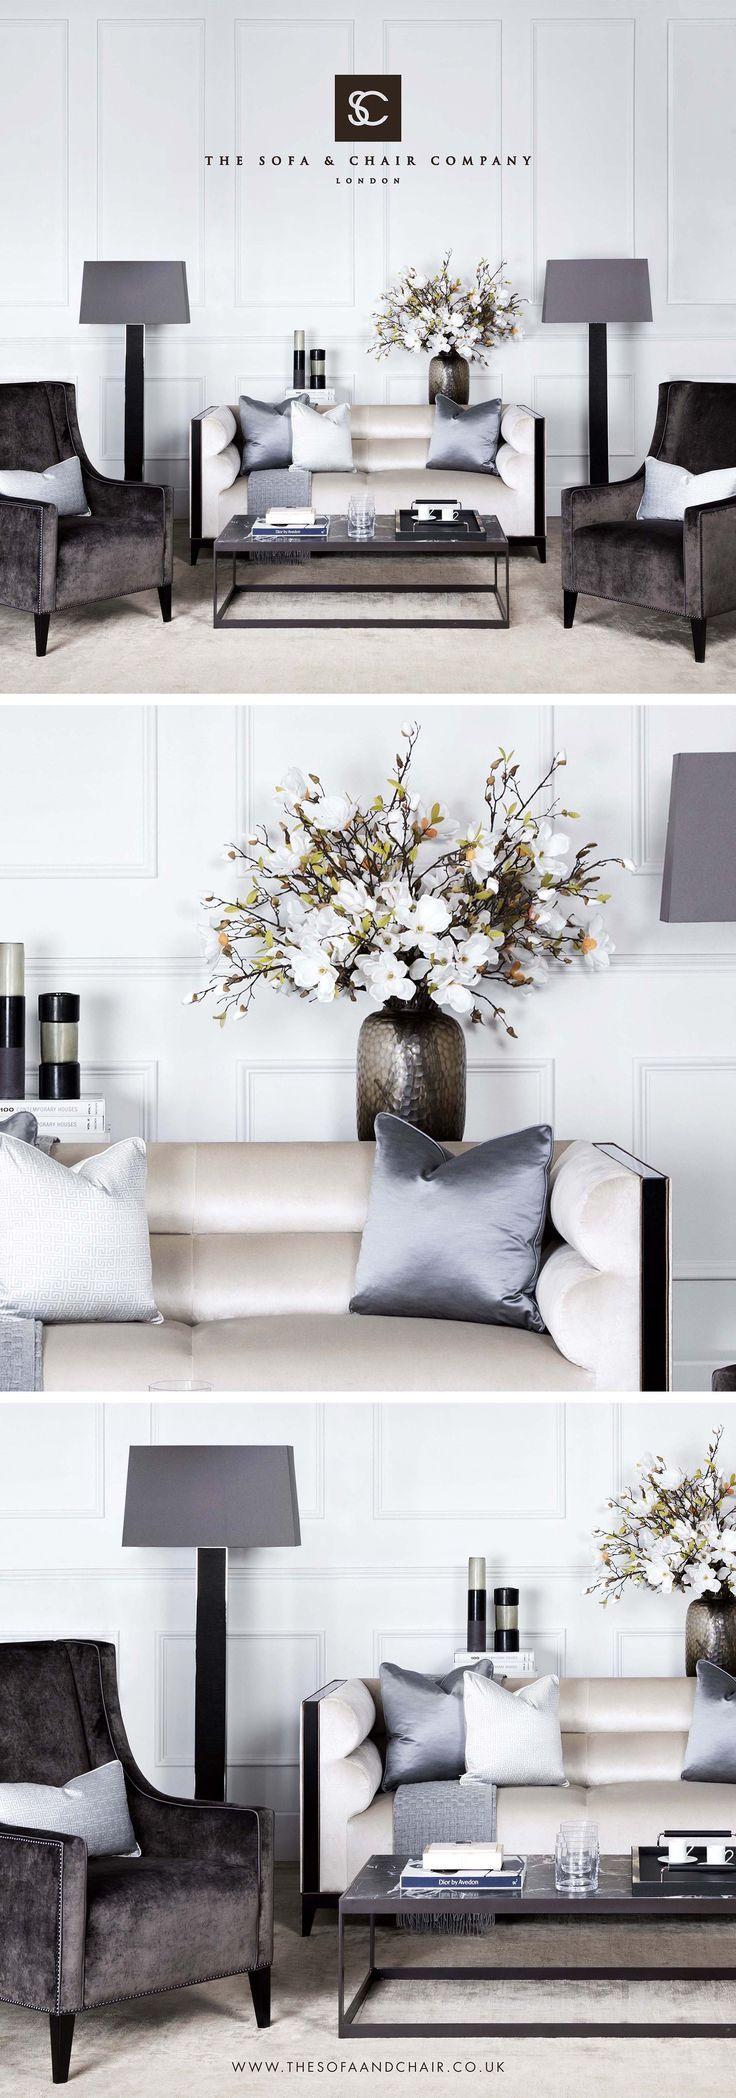 HOME FURNITURE IDEAS Luxury Furniture Designed